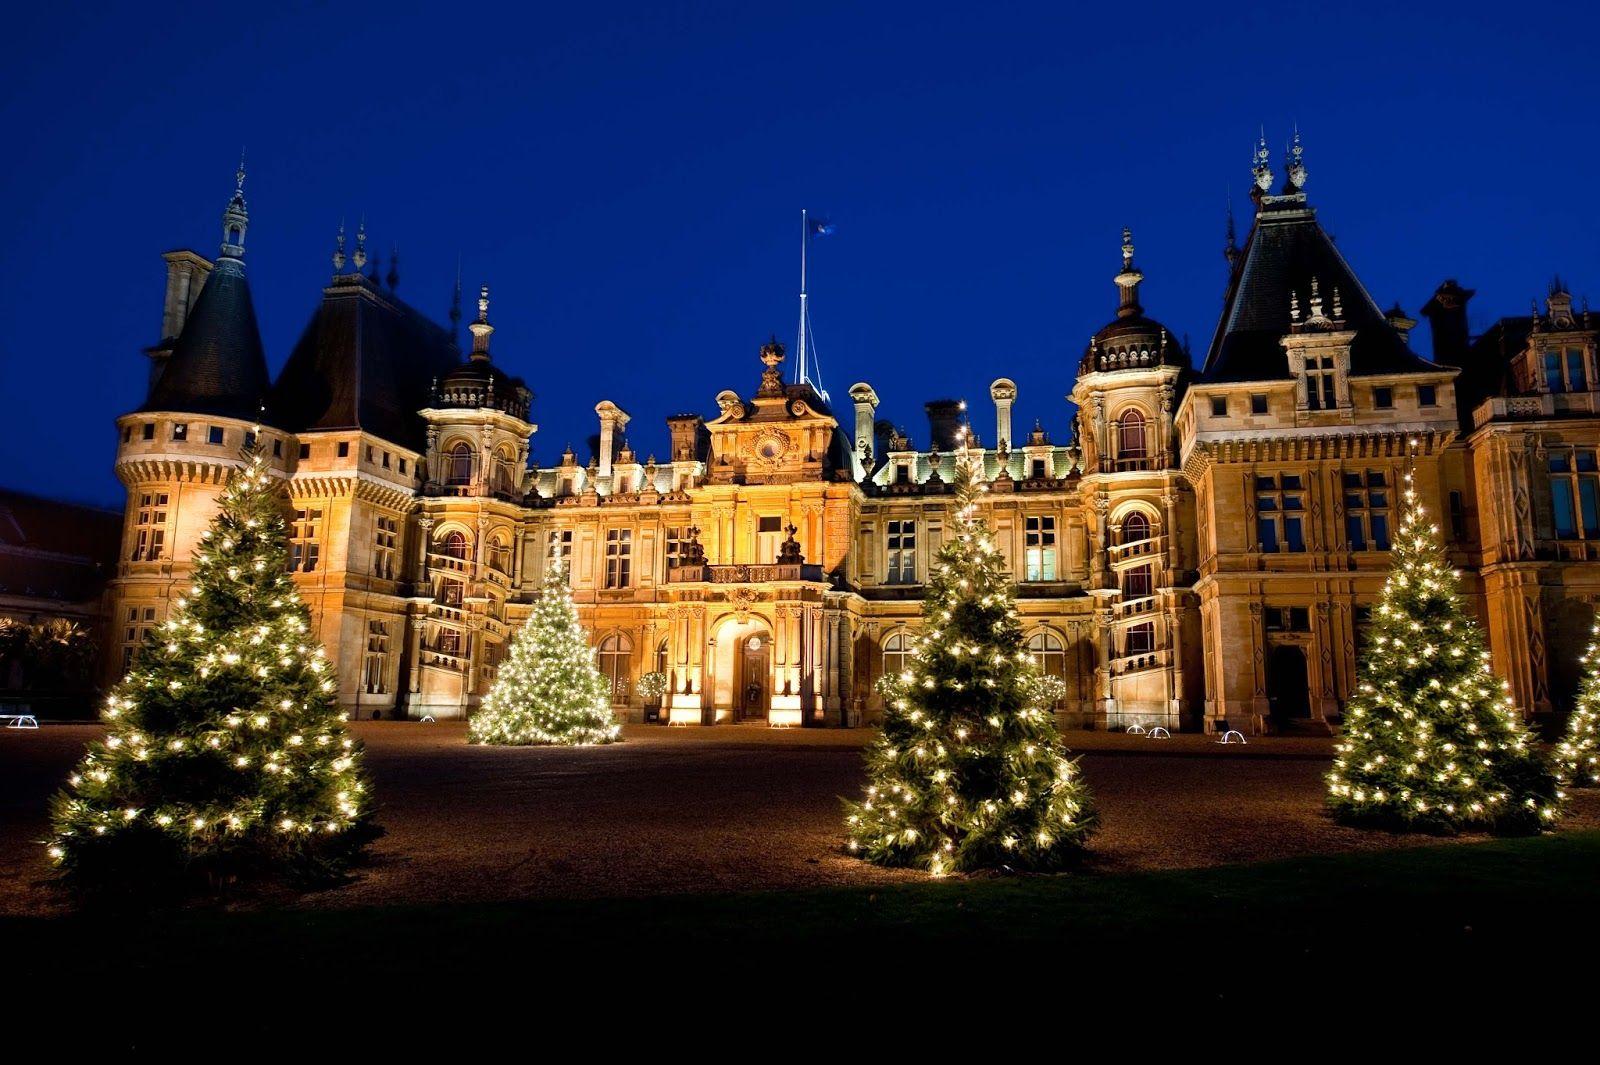 Waddesdon Manor At Christmas Weekend House Manor Christmas Tree Light Up